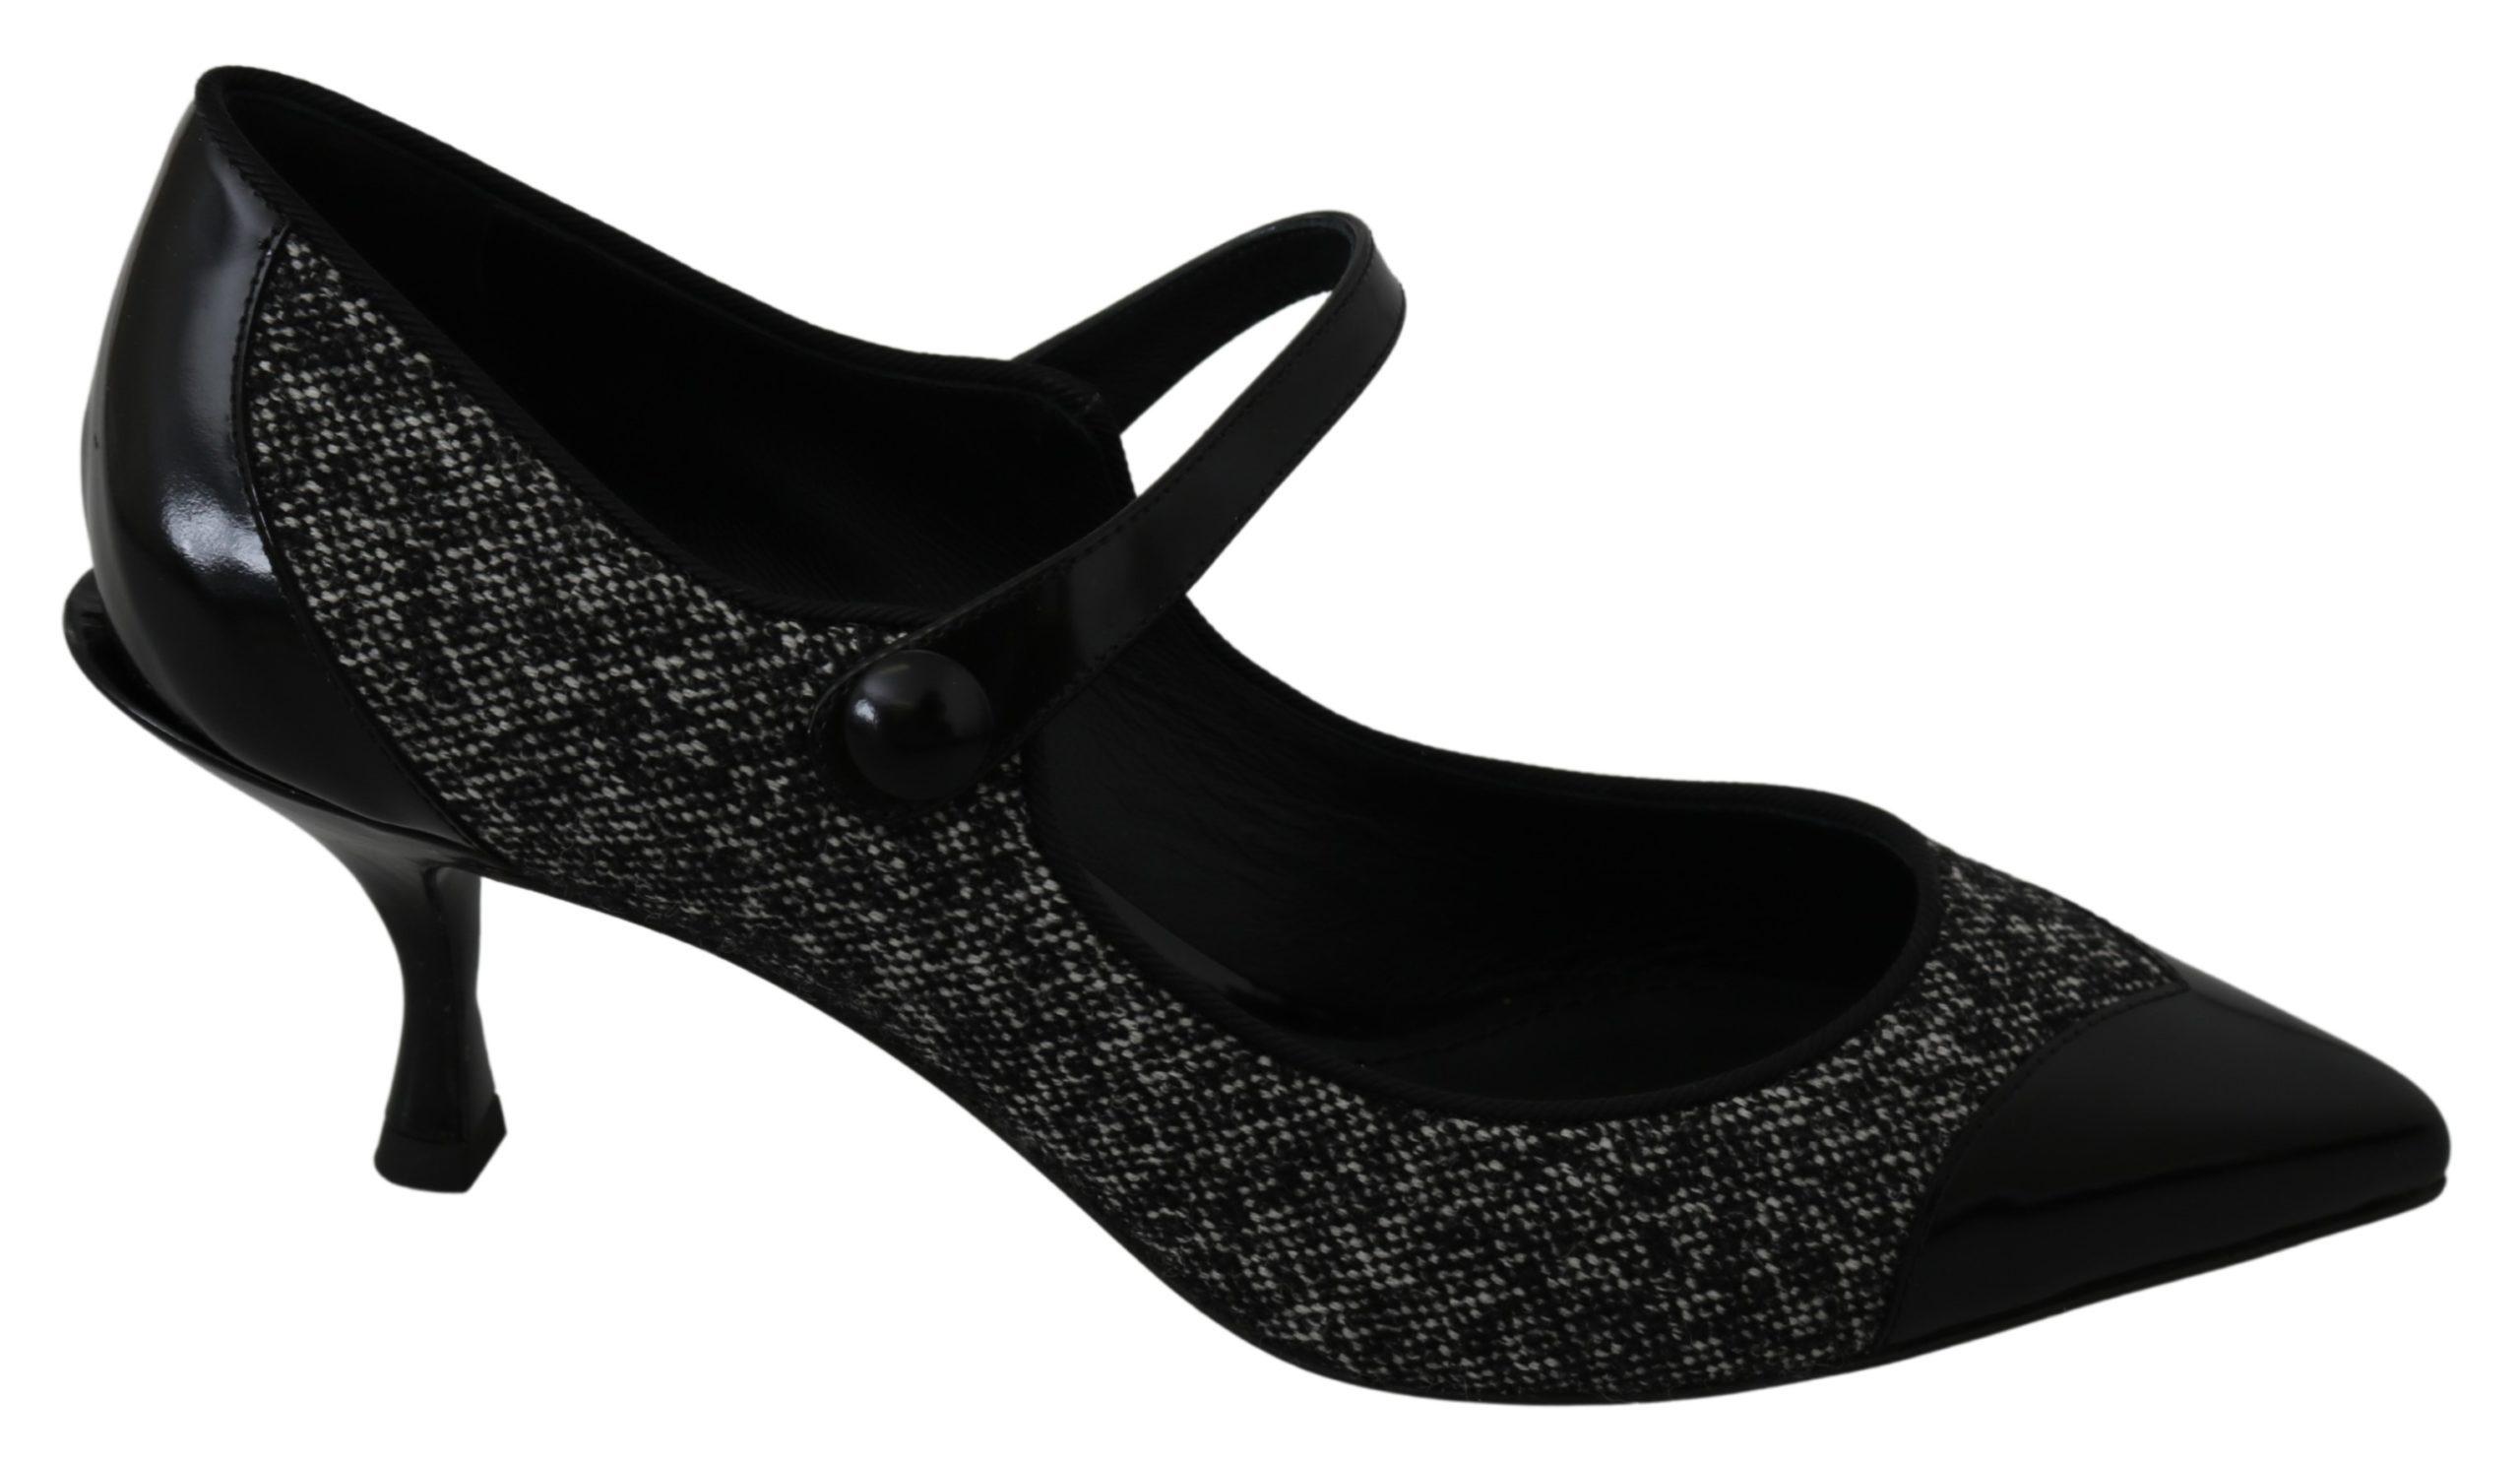 Dolce & Gabbana Women's Mary Janes Boucle Leather Pumps Black LA7248 - EU39/US8.5